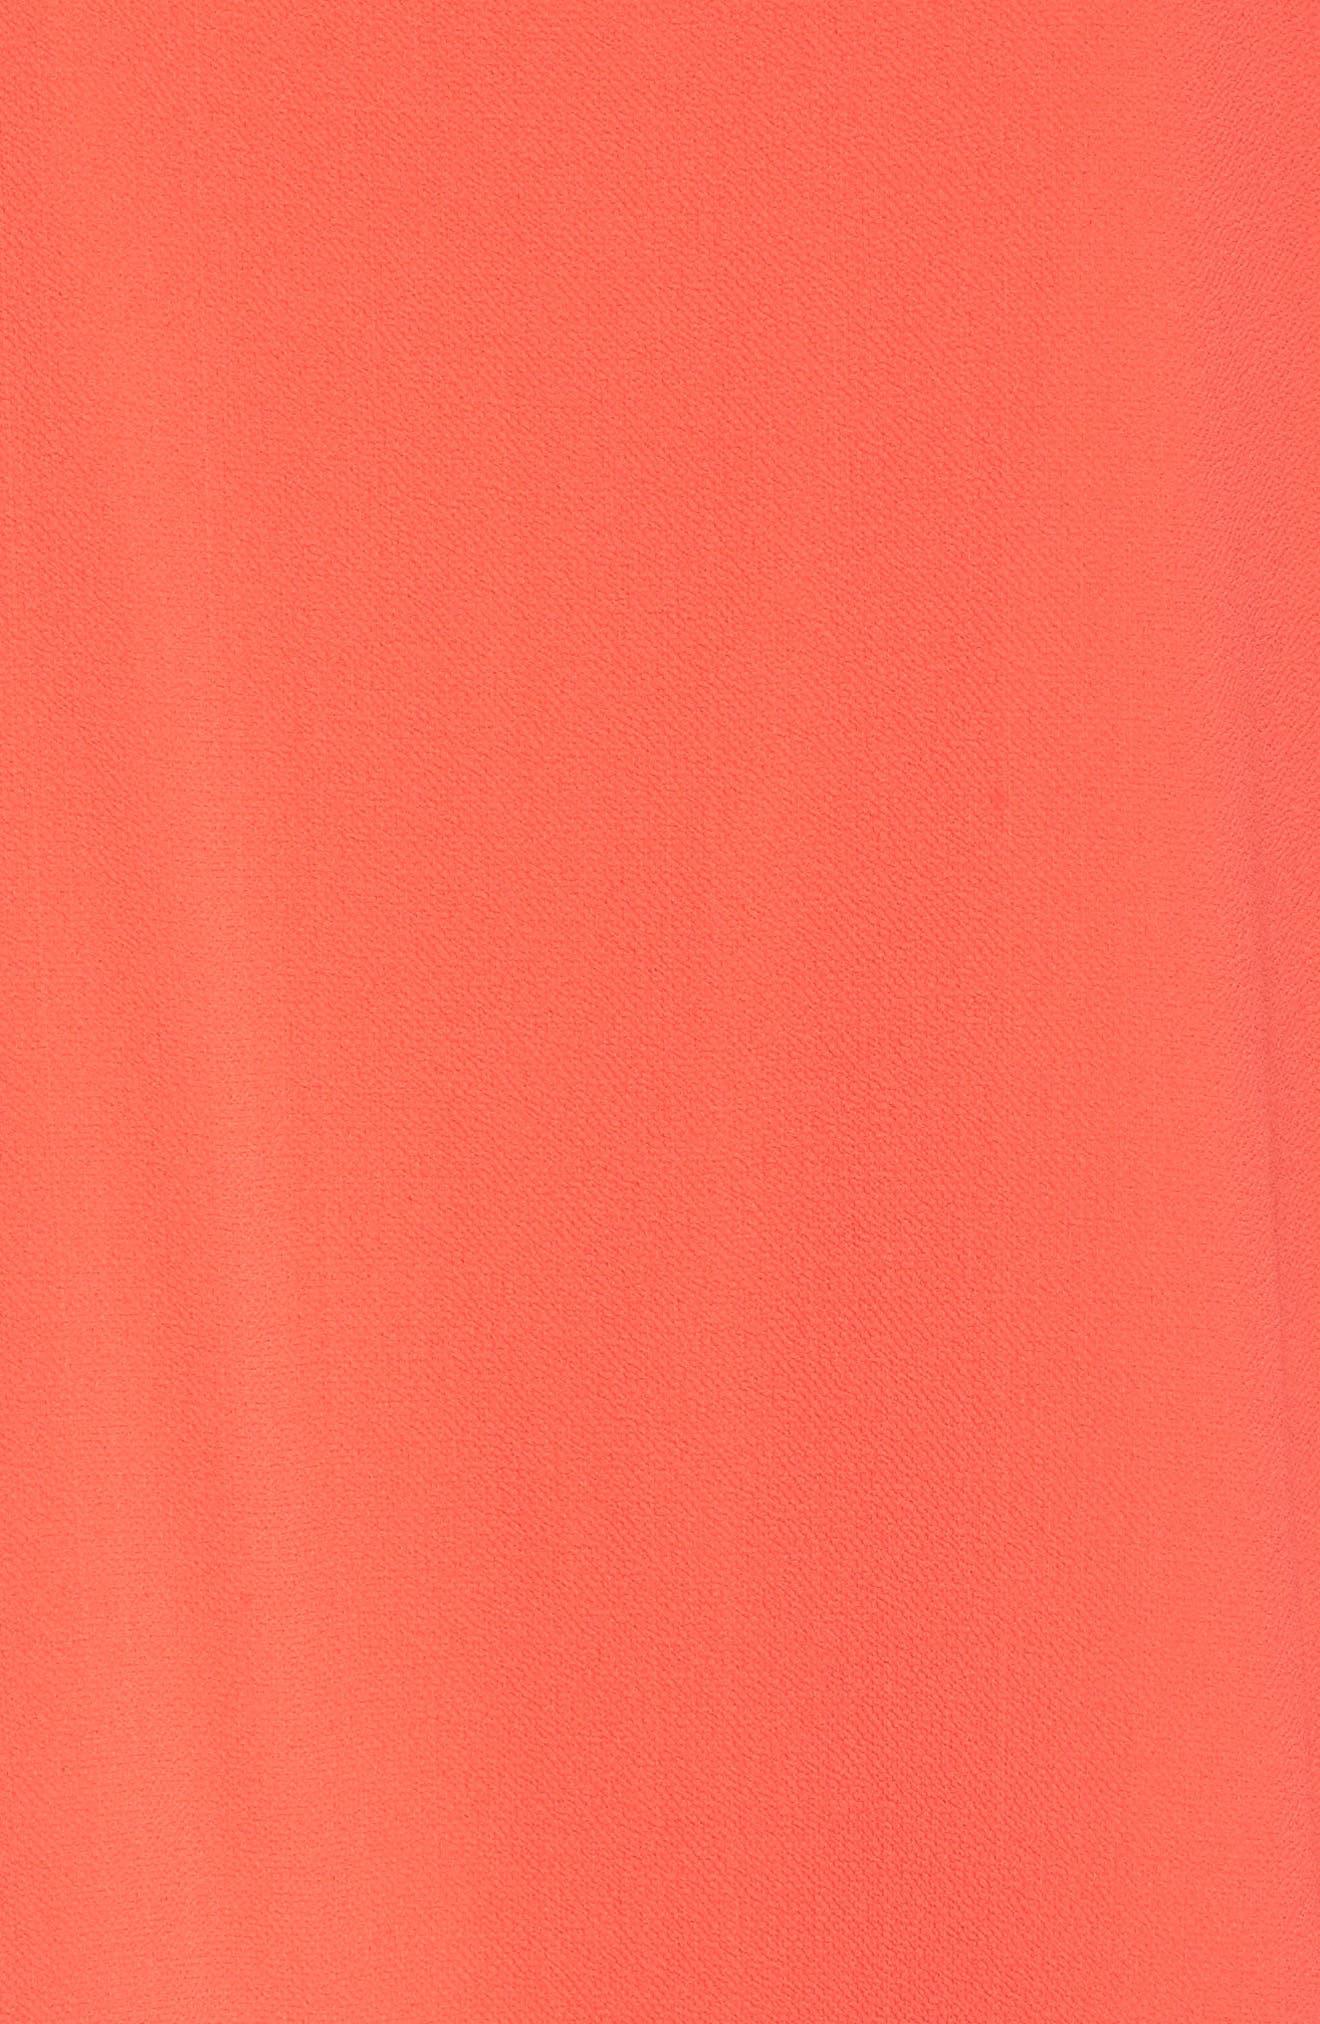 Off the Shoulder Ruffle Dress,                             Alternate thumbnail 48, color,